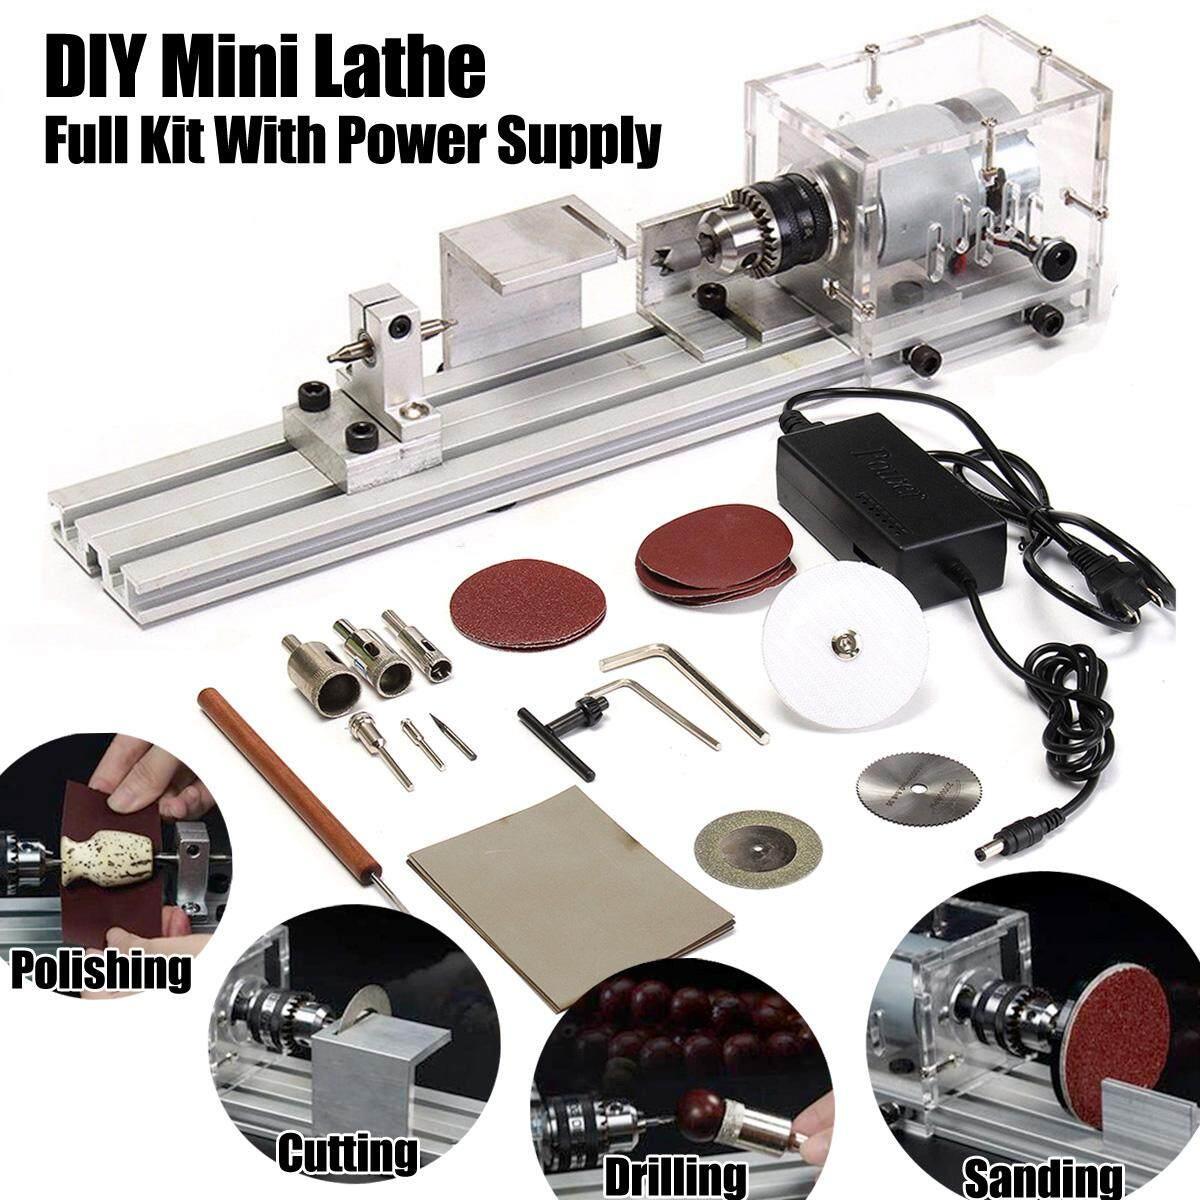 Hình ảnh Mini Lathe Beads Machine Polisher Table Saw Mini DIY Wood Lathe Kit Accessory - intl